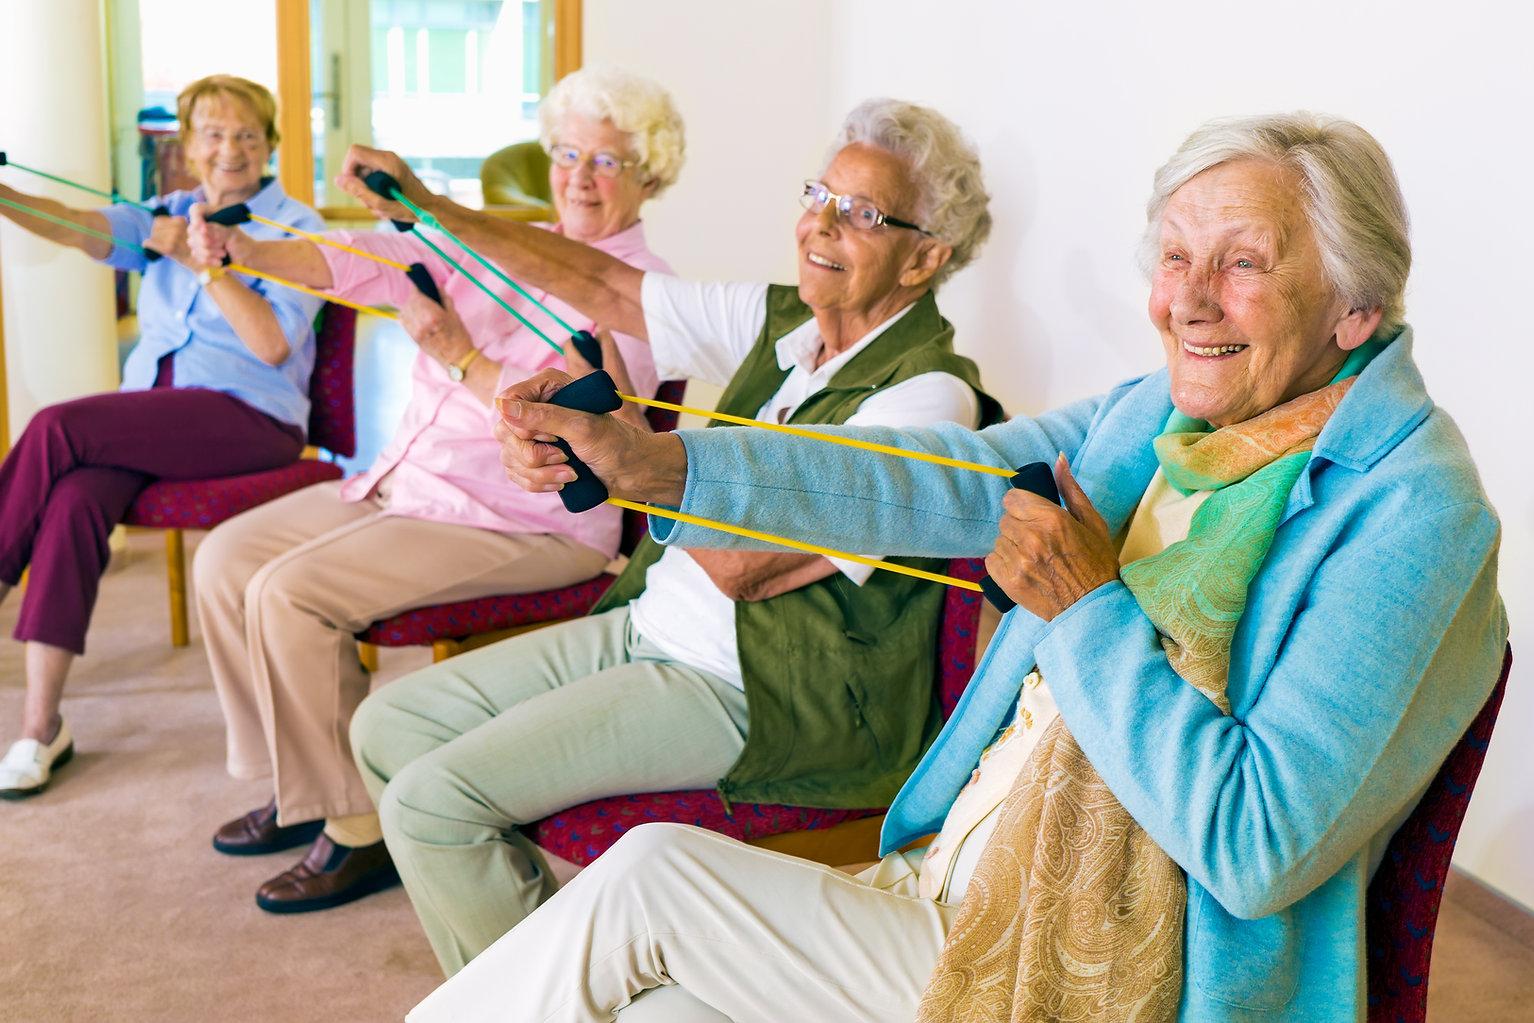 Group of four smiling senior women tonin